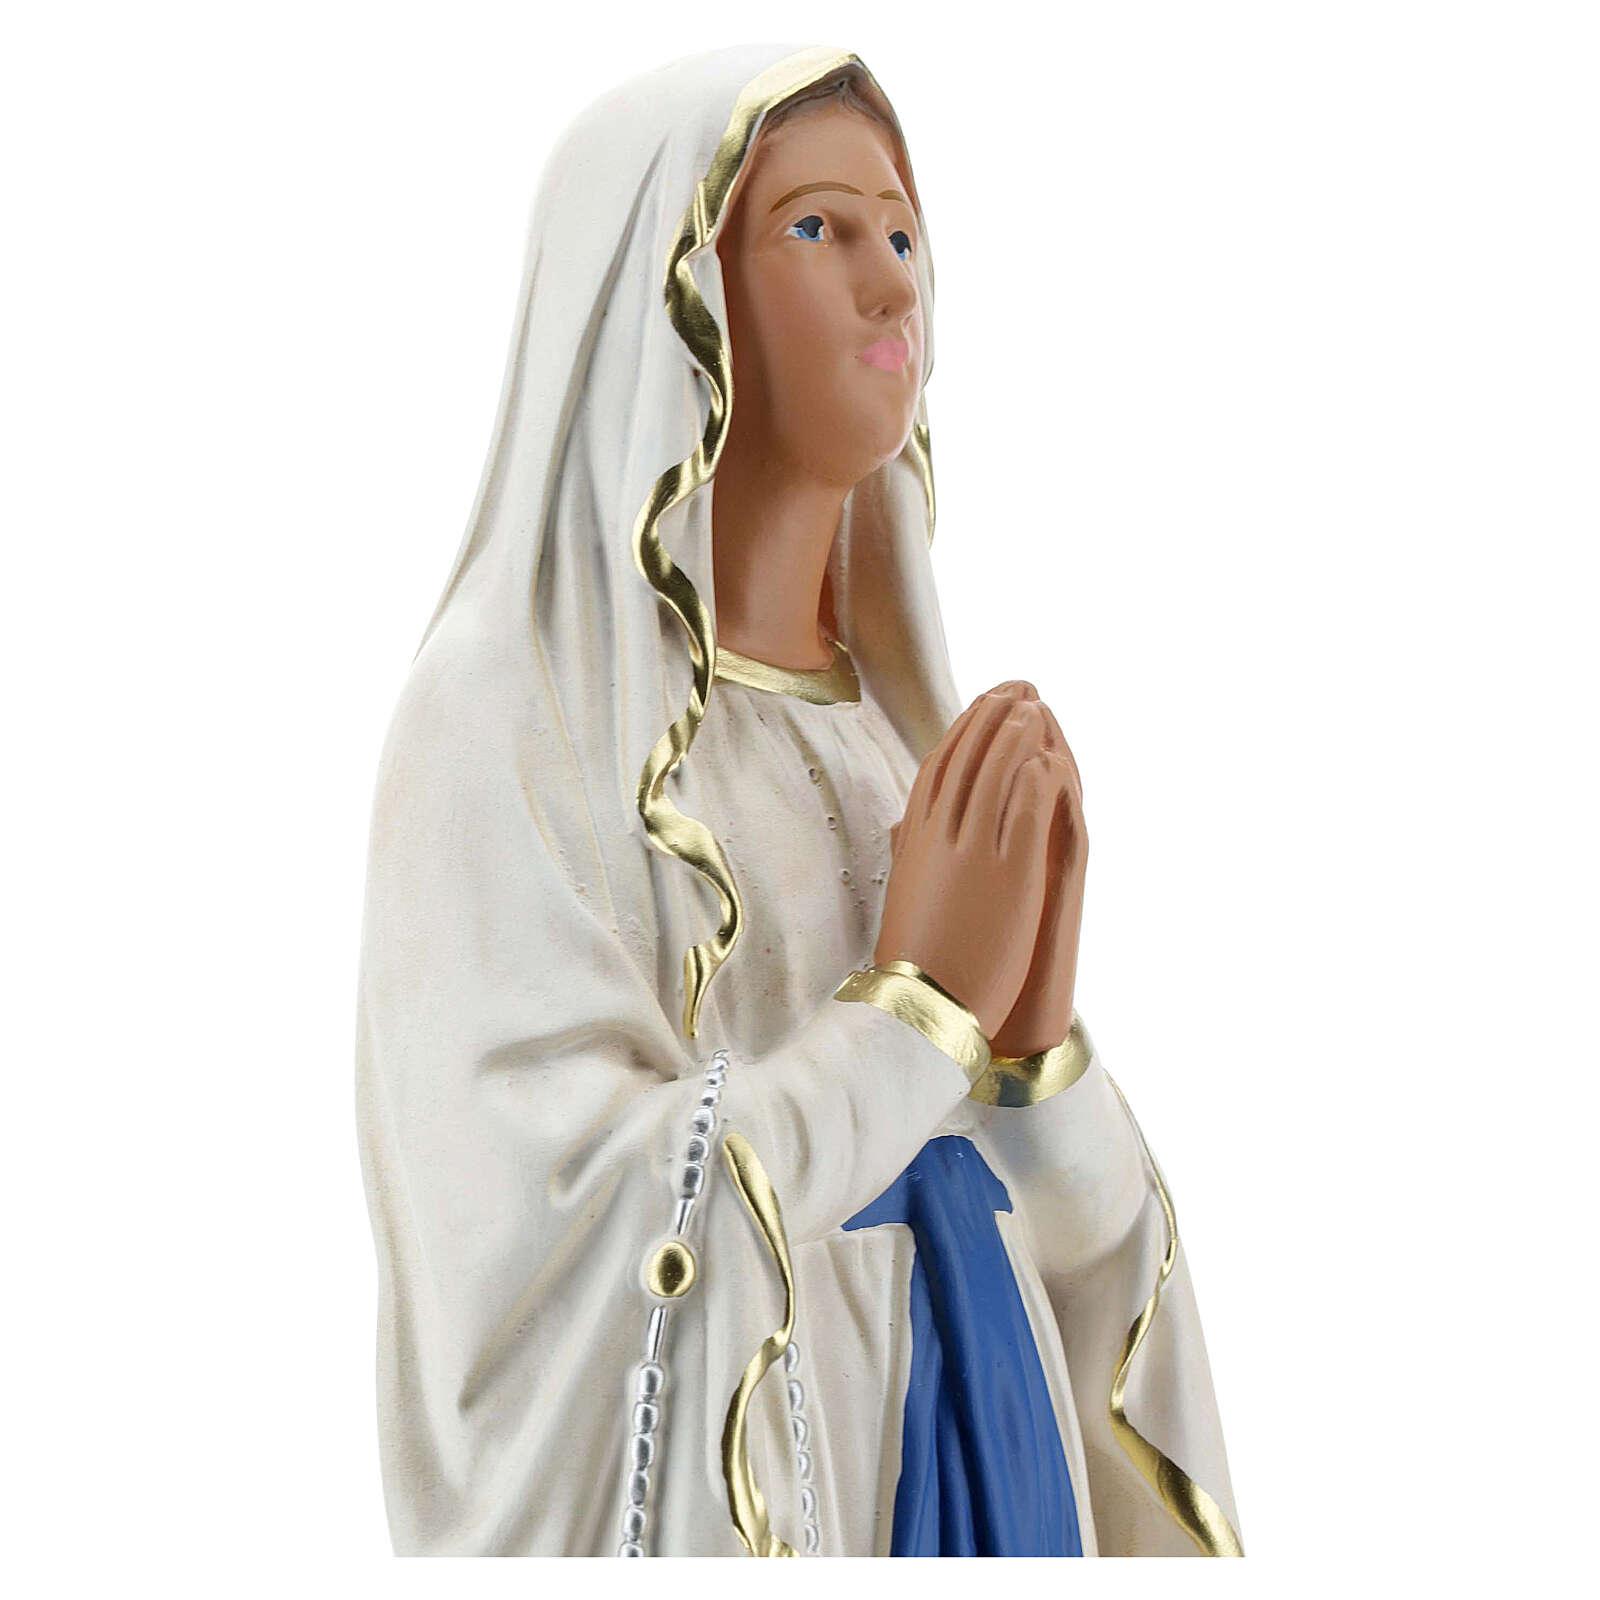 Statua Madonna di Lourdes 40 cm gesso dipinta a mano Barsanti 4